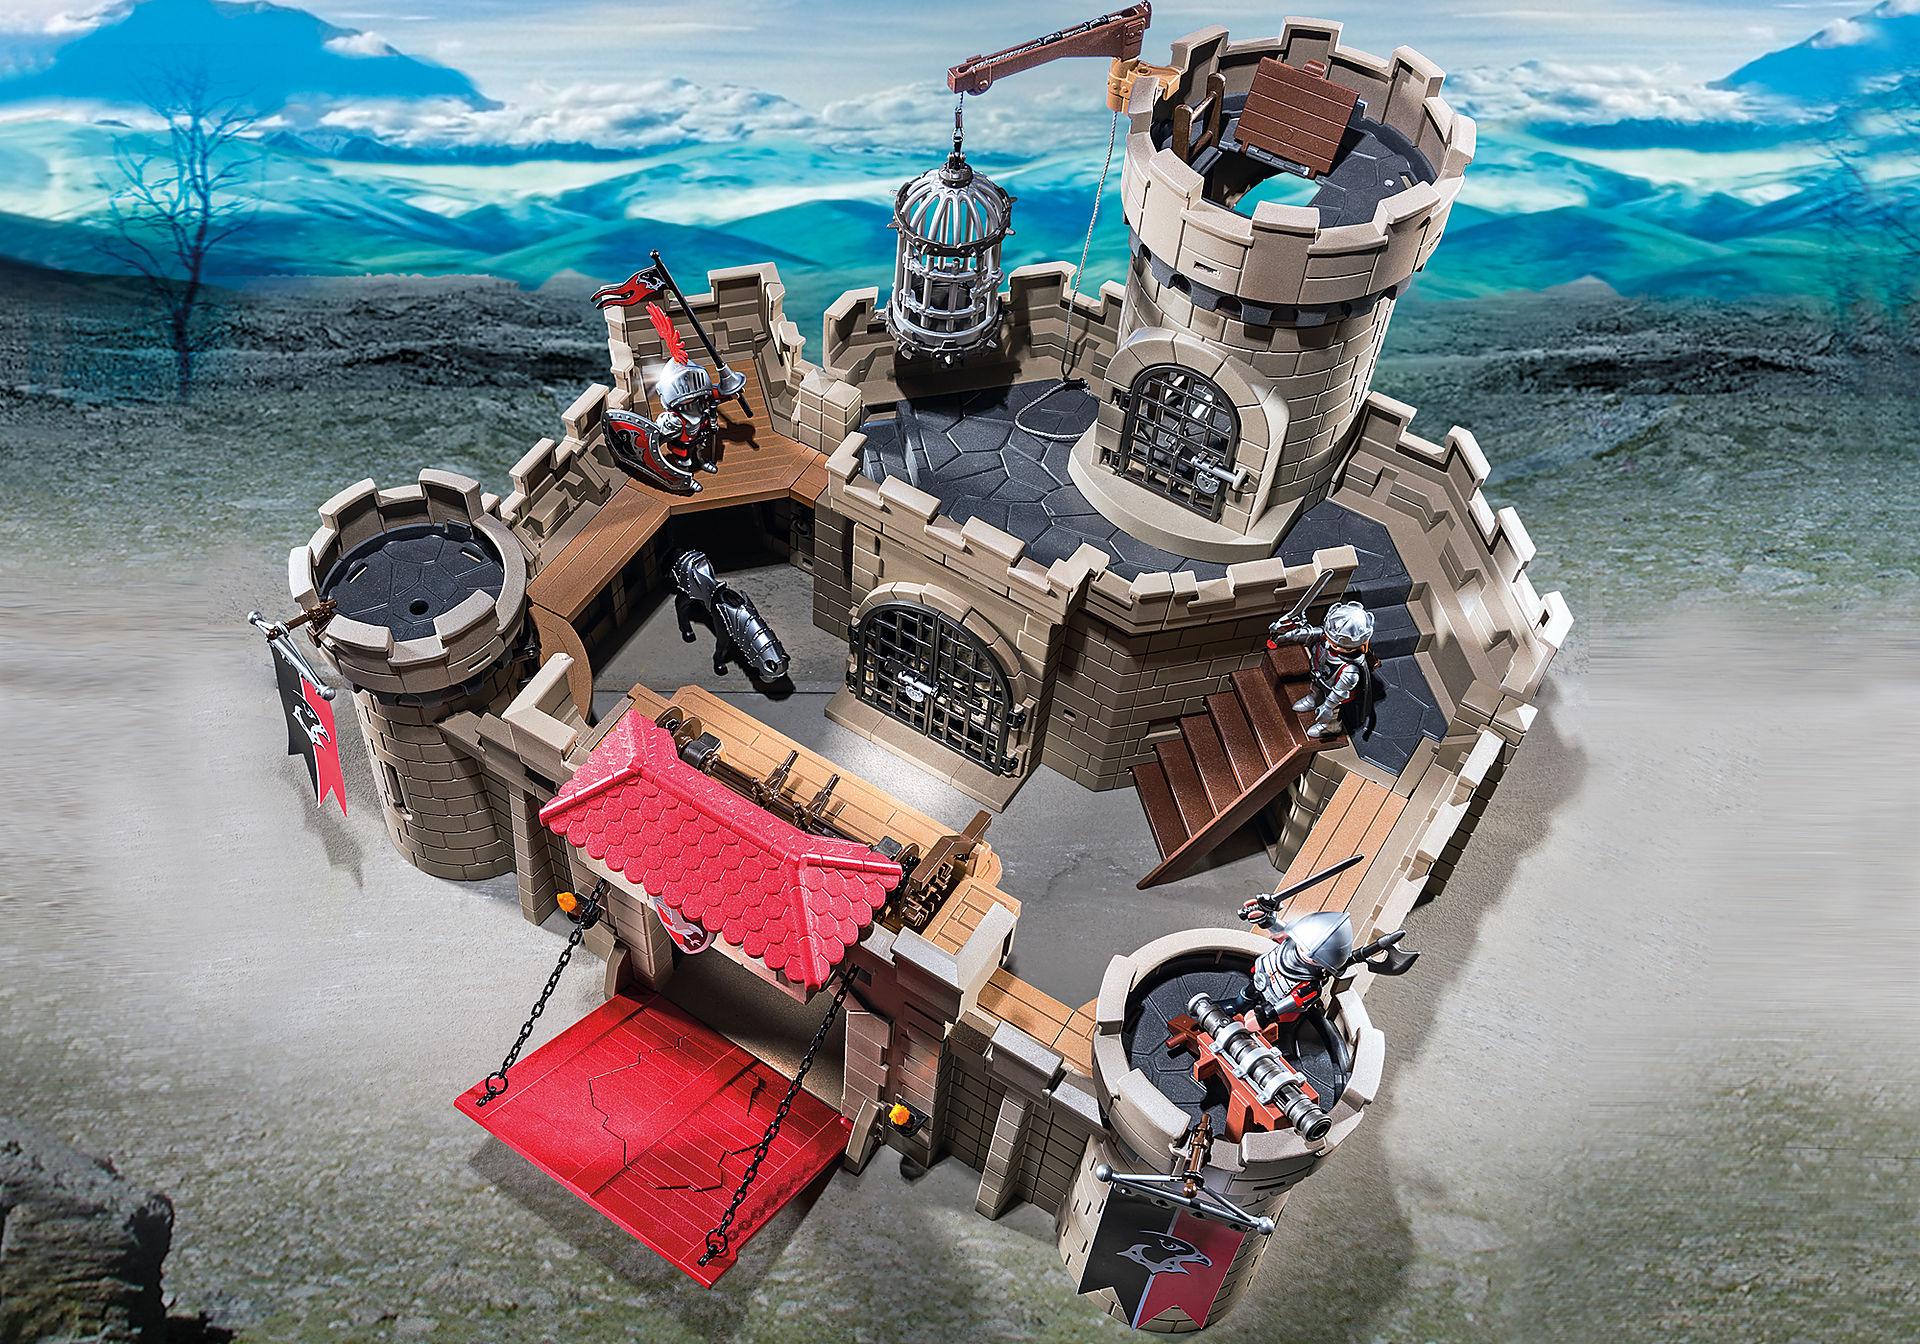 http://media.playmobil.com/i/playmobil/6001_product_extra1/Hawk Knights` Castle